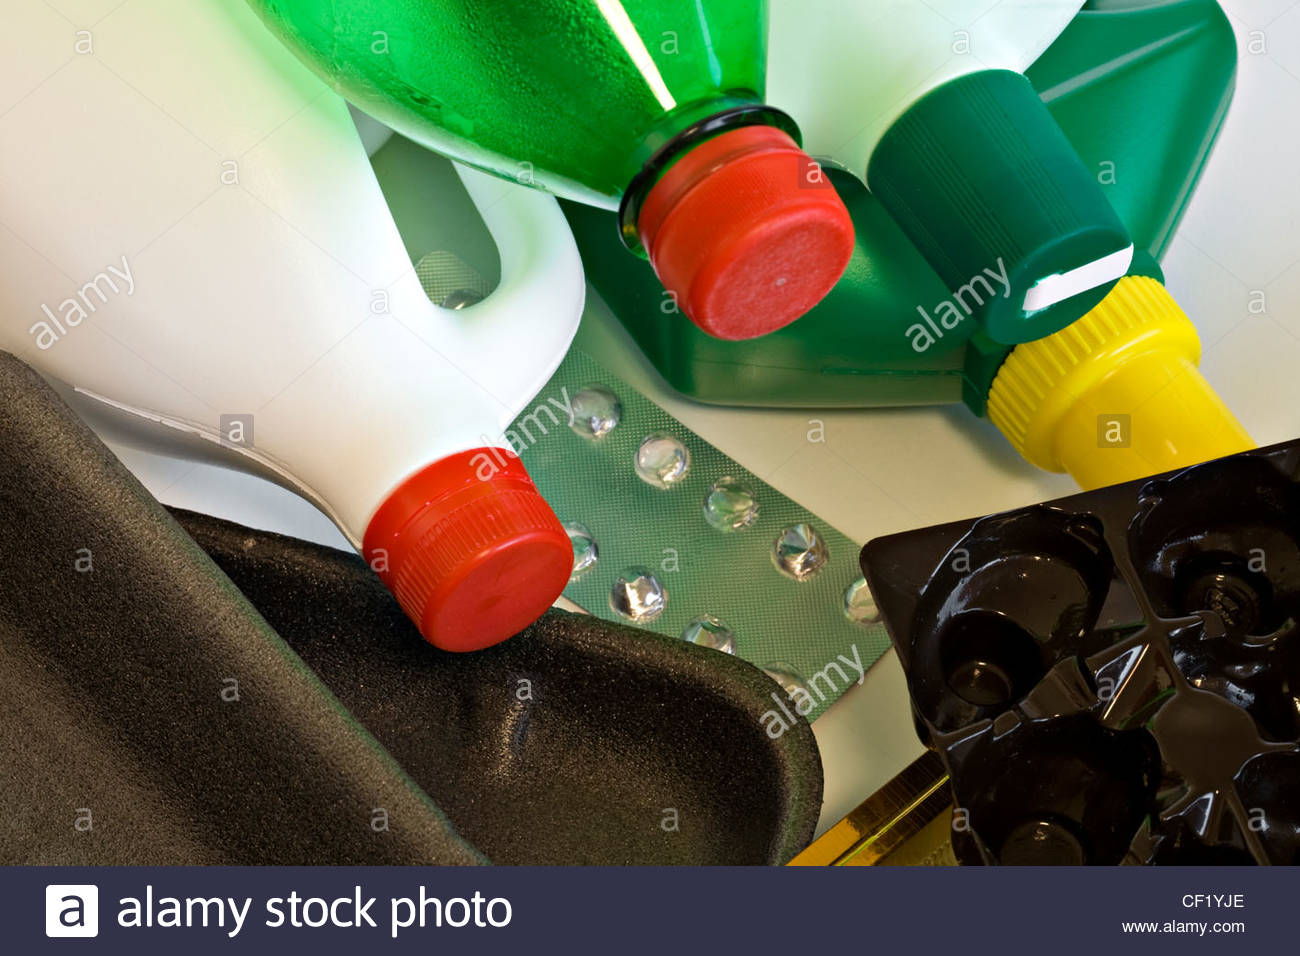 Kunststoff für Recycling Stockbild